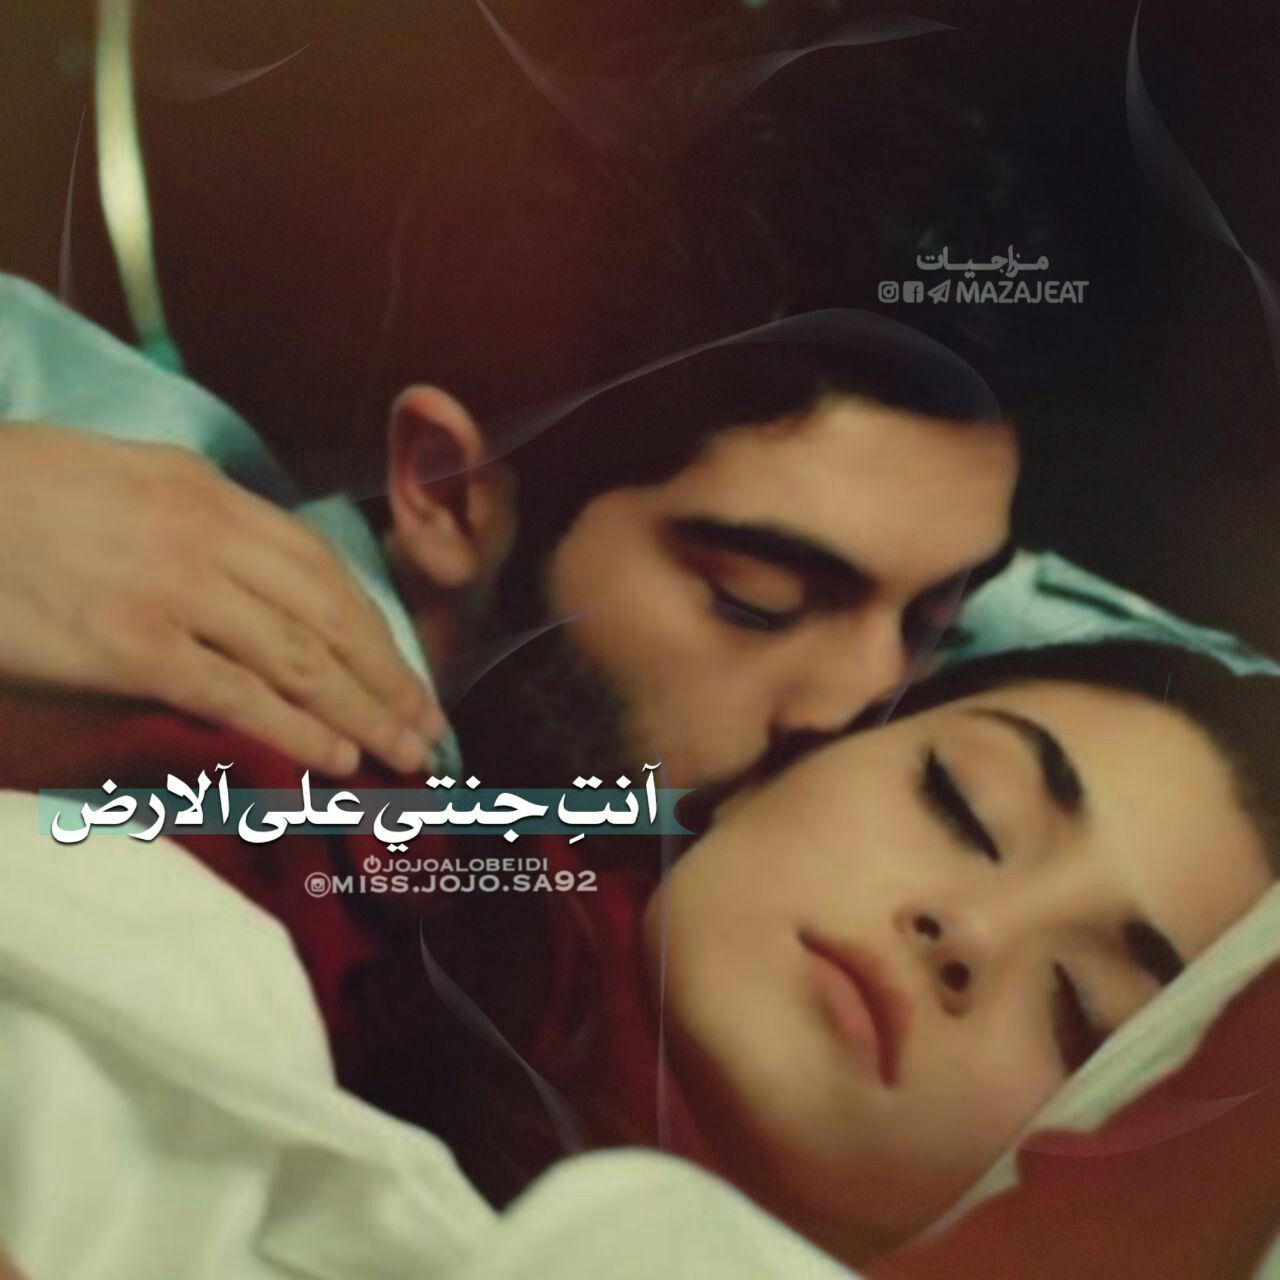 Pin By K I N G O F Y E M E N On اشعار عراقية Unique Love Quotes Cute Love Stories Love Words